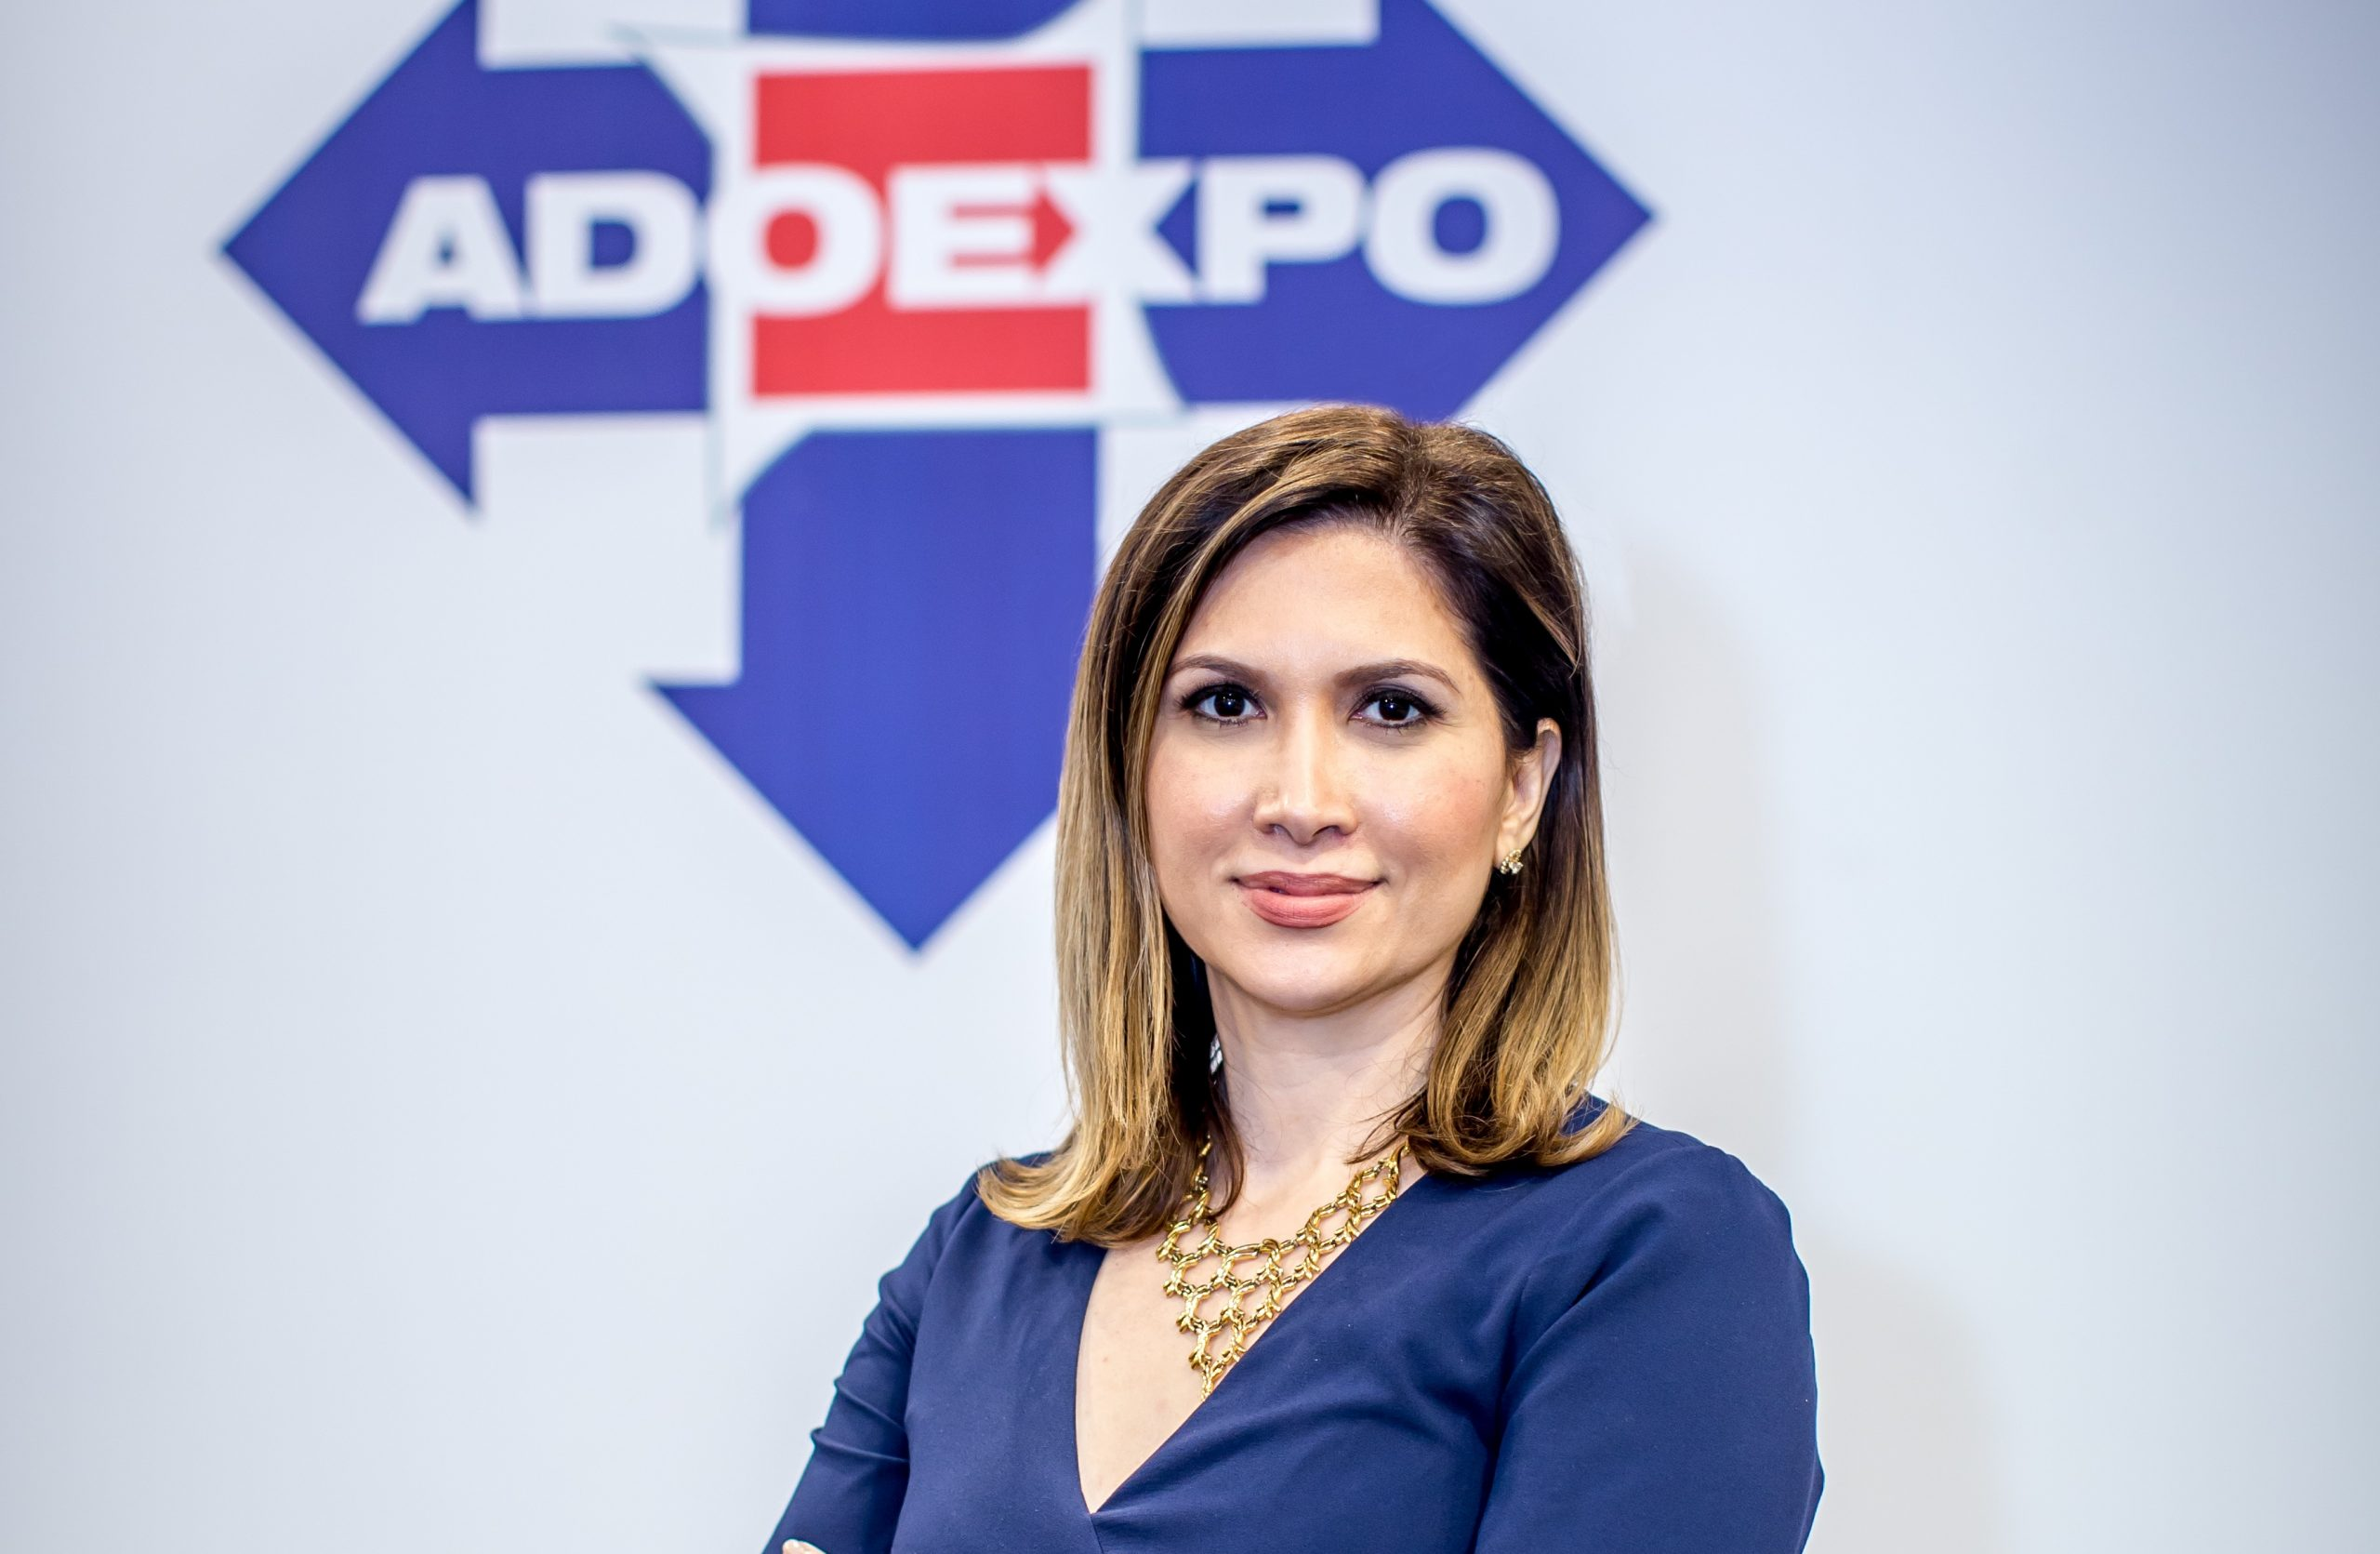 foto odile miniño bogaert, vicepresidente ejecutiva de adoexpo